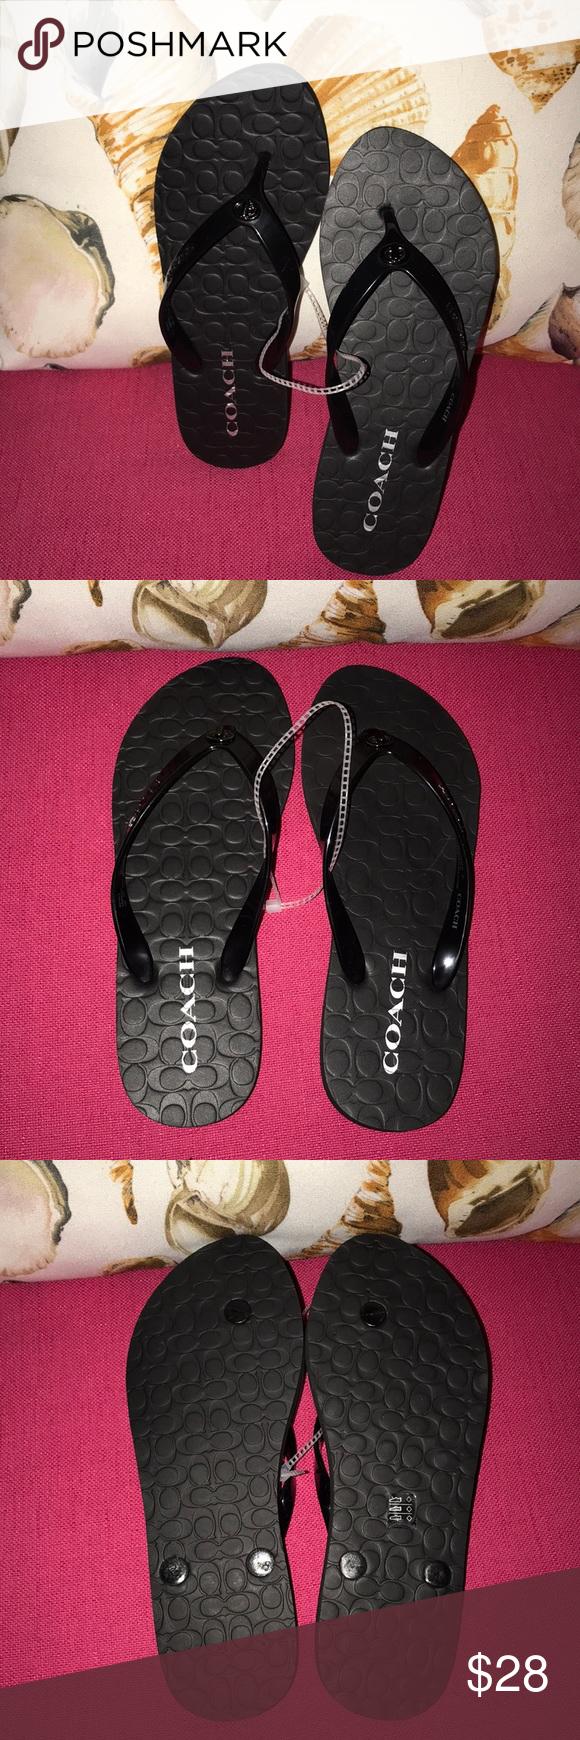 01fc7f38c8da NWOT Coach flip flops ALERT NEW LISTING NWOT Coach flip flops. Rubber  bottom with plastic upper. Super cute and comfy! Women s size 6. Coach  Shoes Sandals